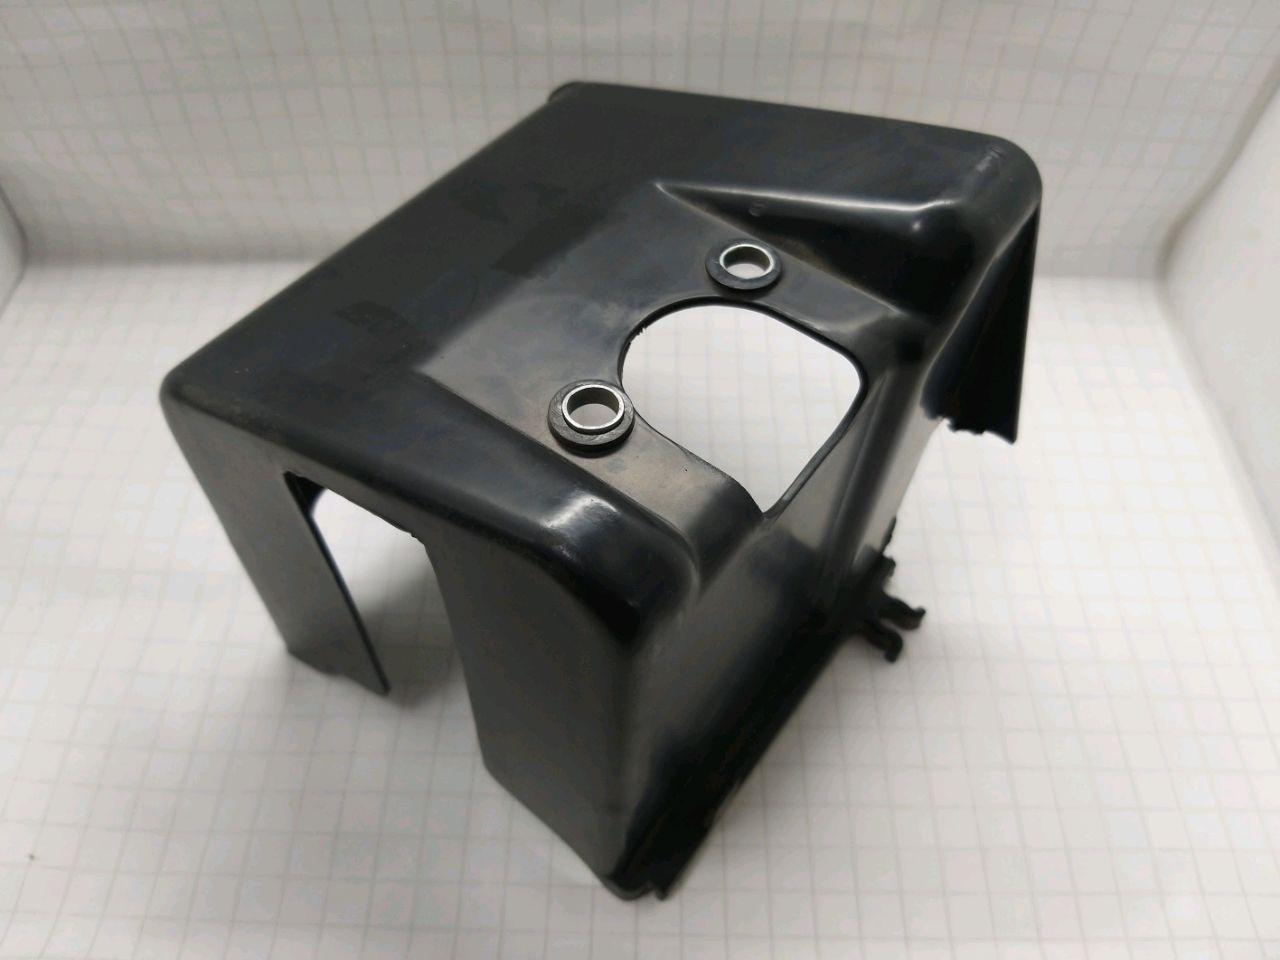 Capac сilindr.plastic SPG950